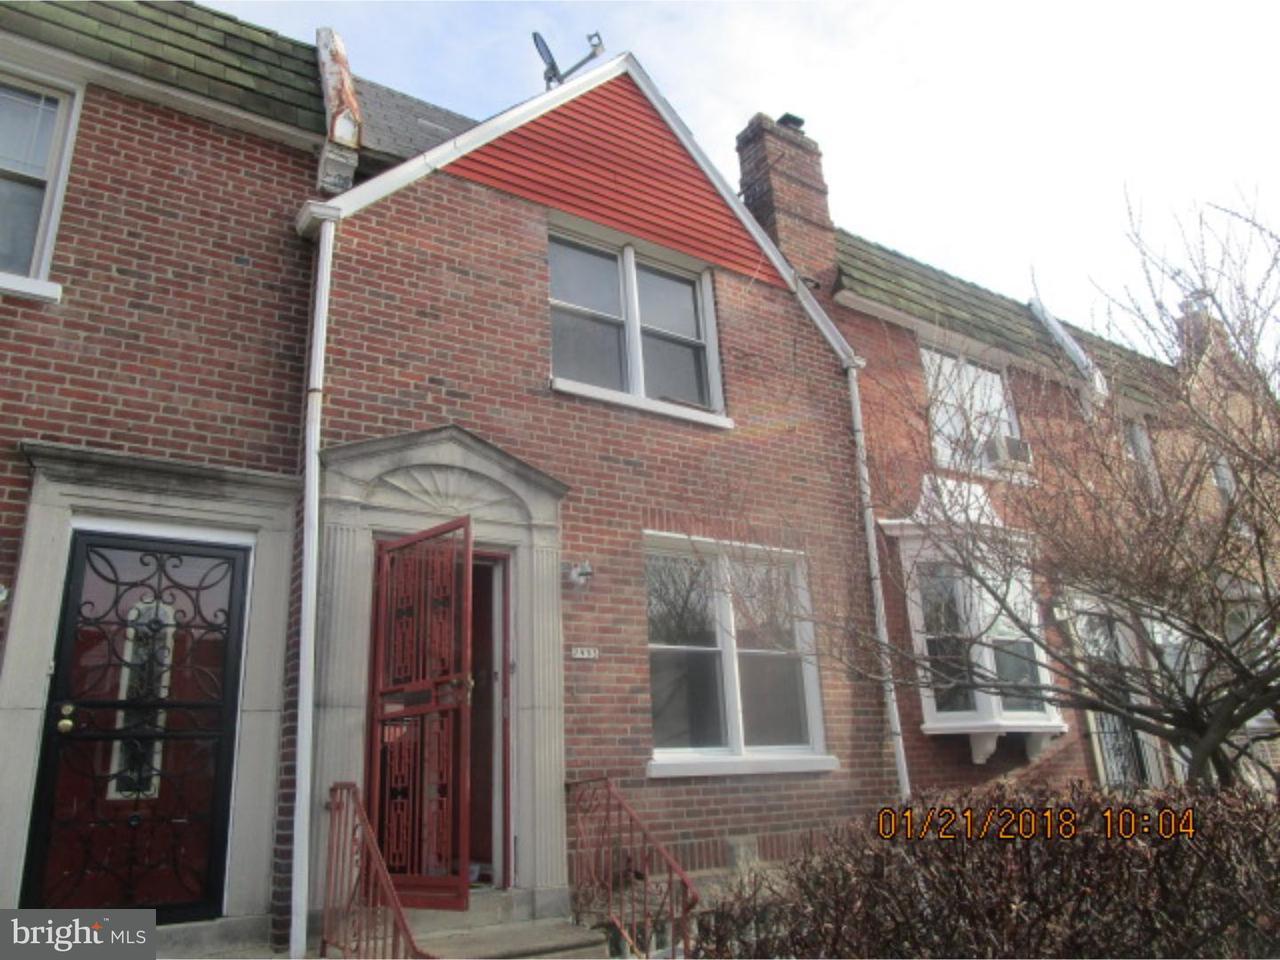 7953  Provident Philadelphia, PA 19150